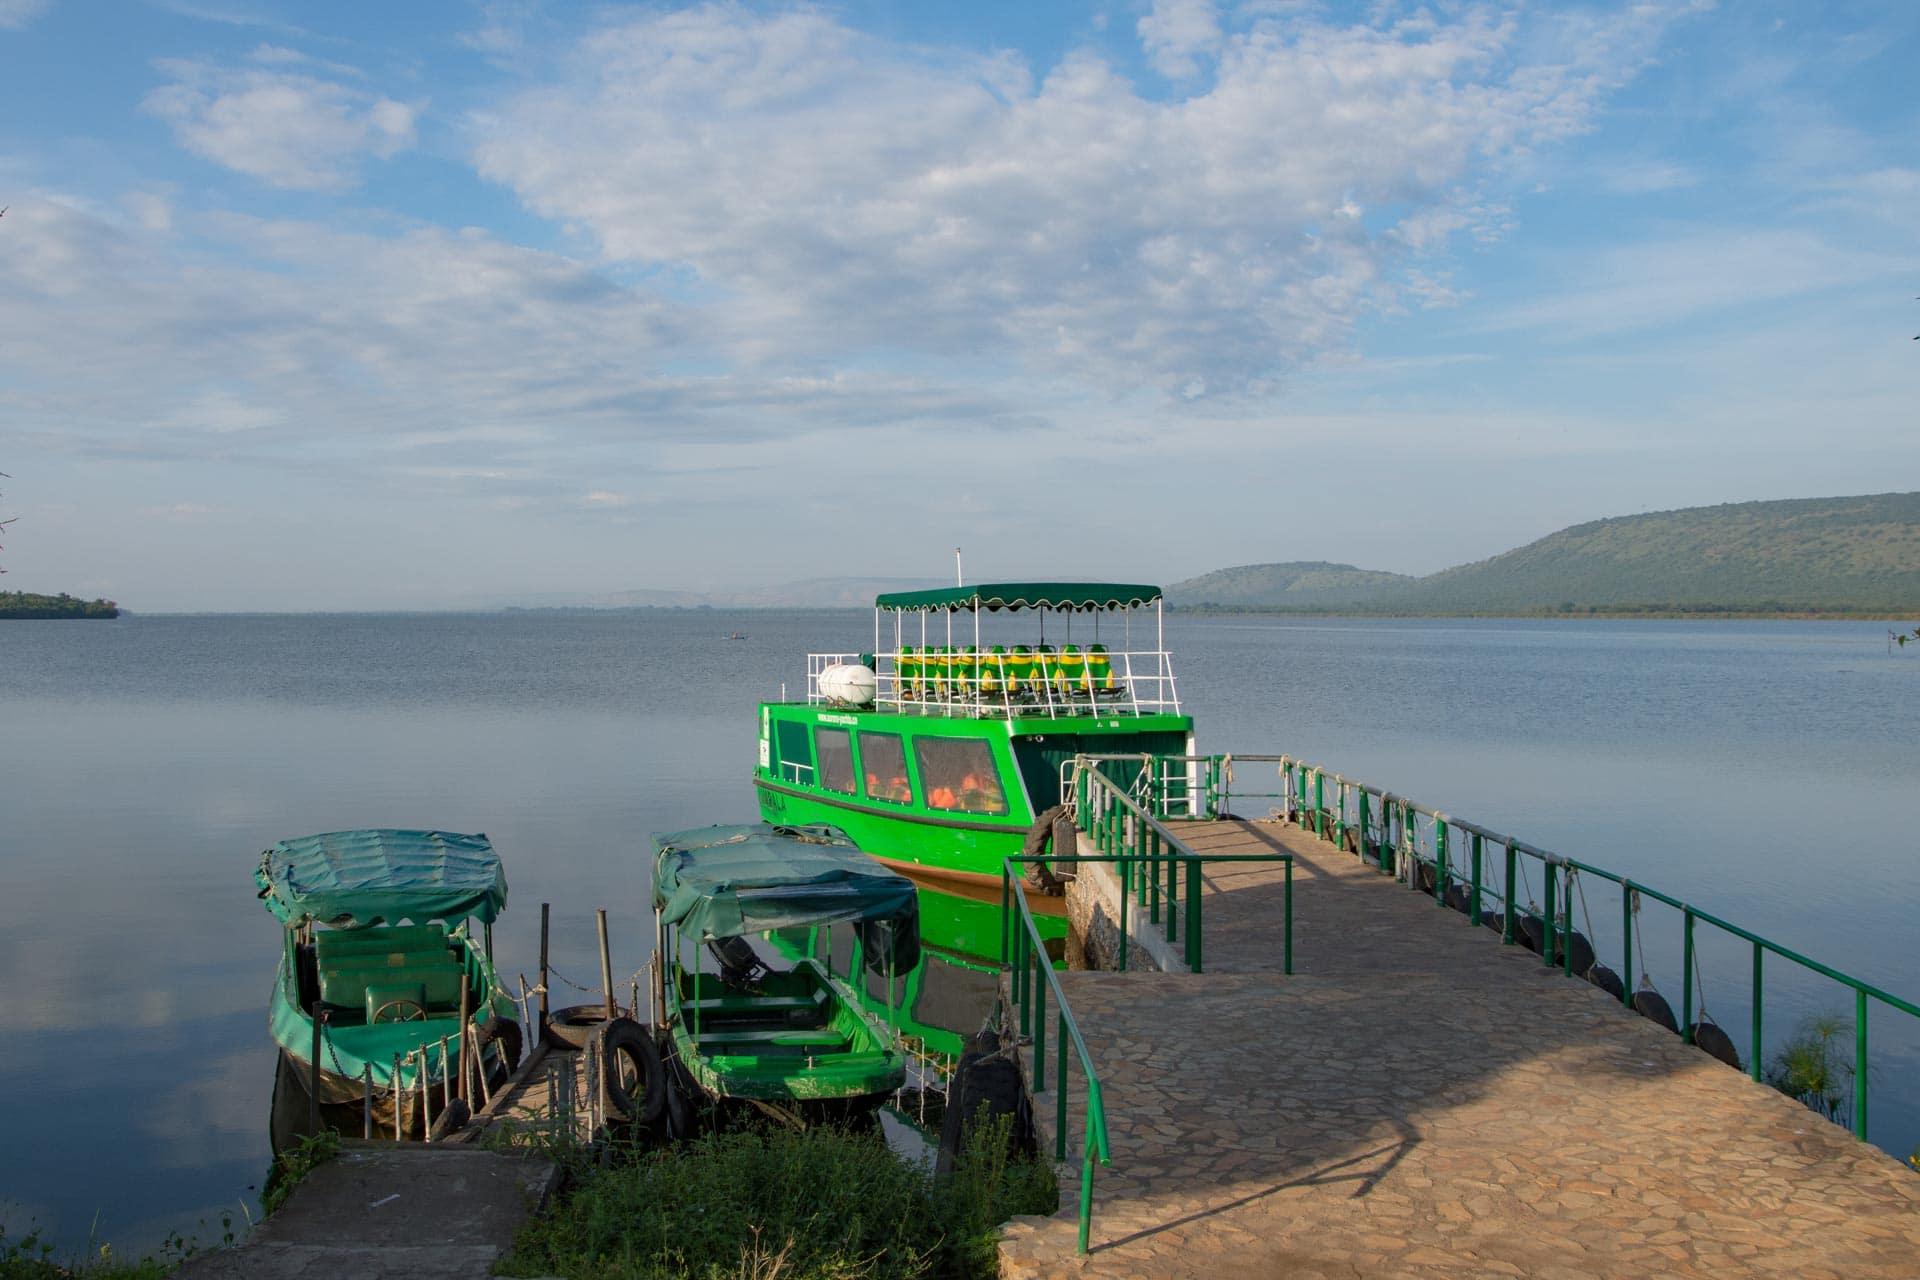 Lake Mburo in Uganda